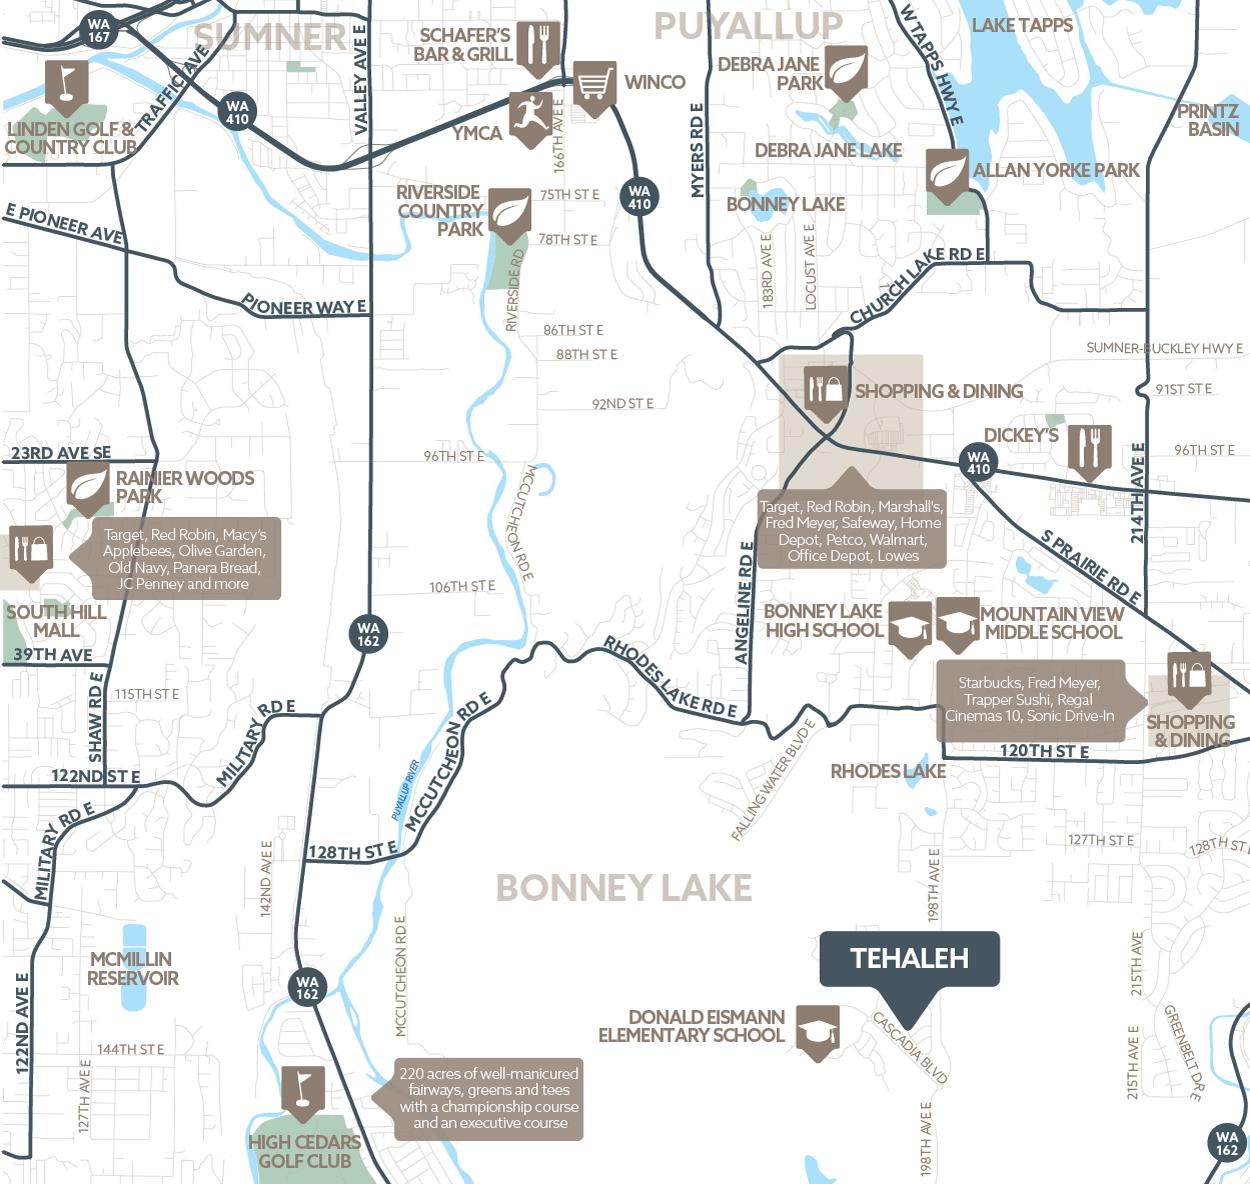 MainVue Homes at Tehaleh amenity map